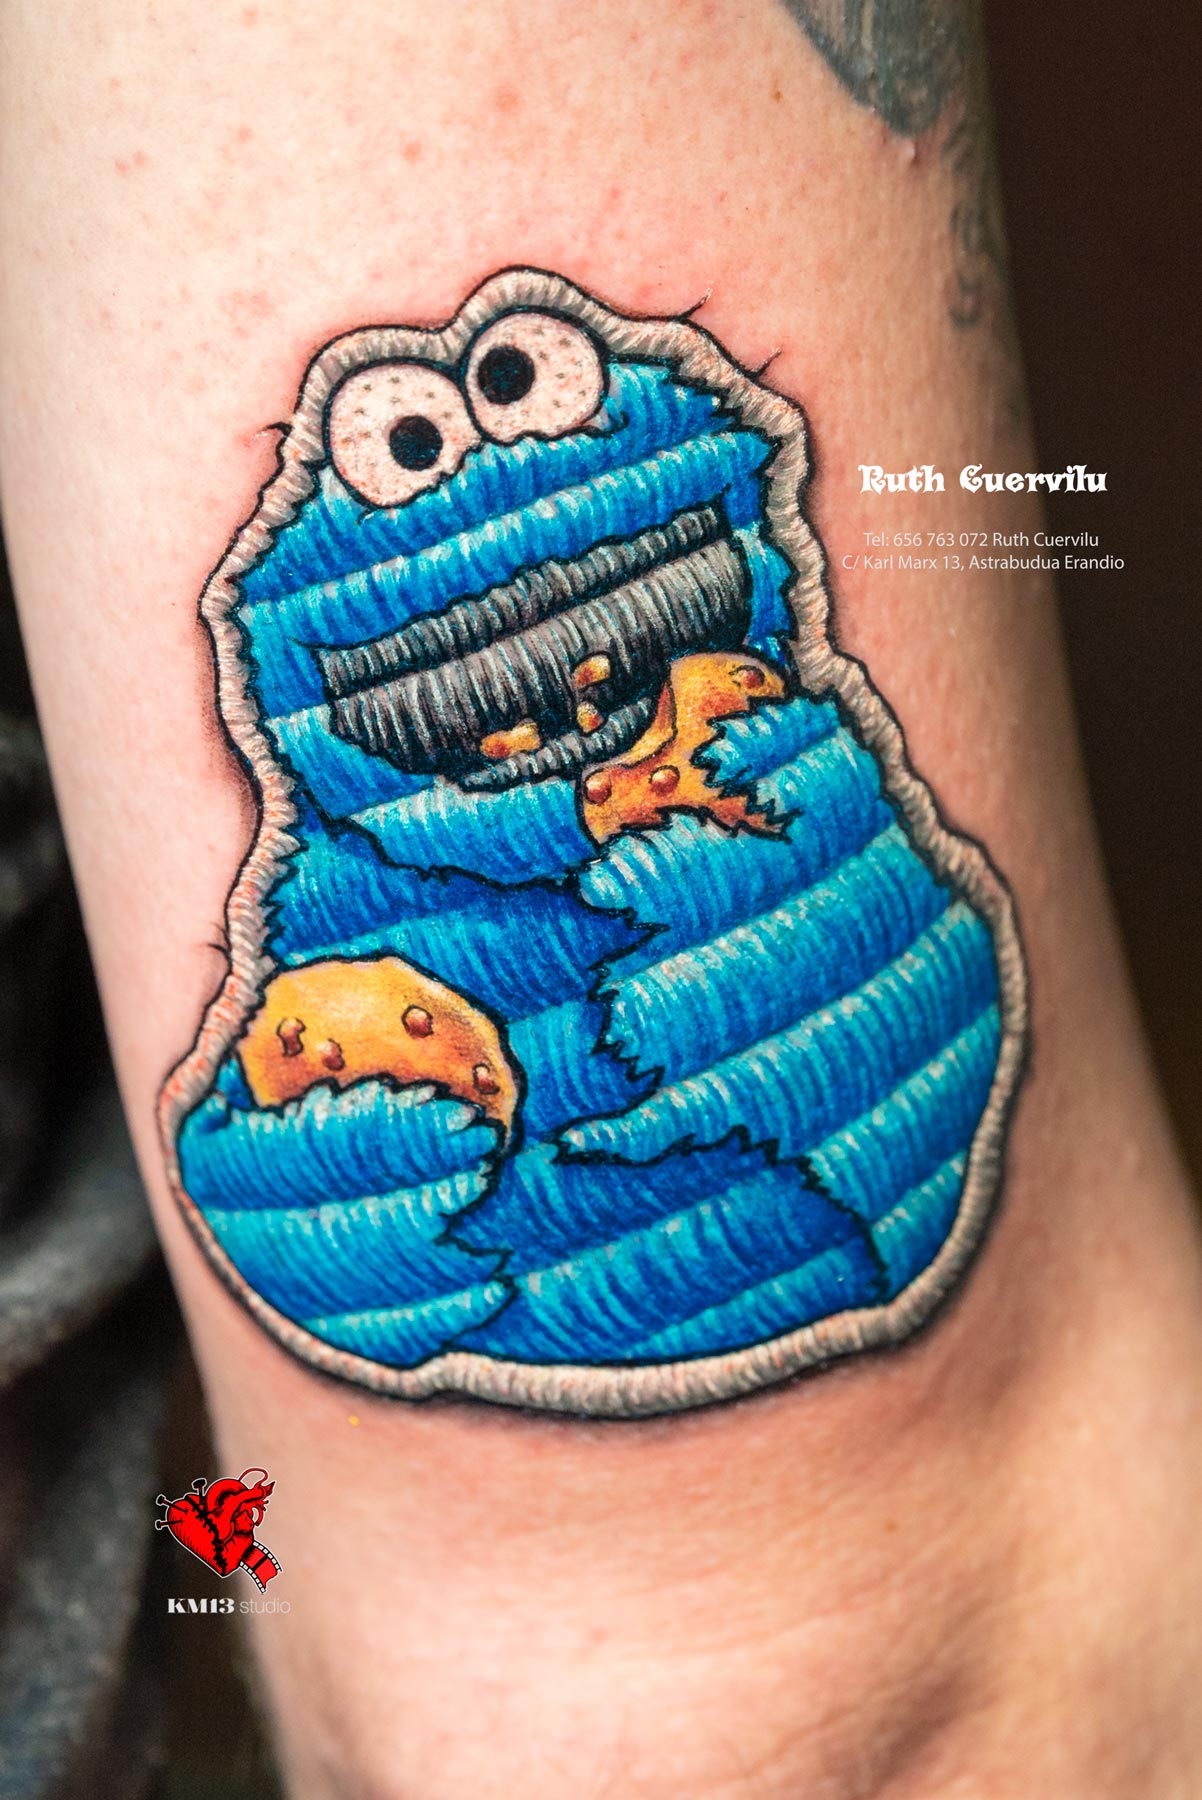 Tatuaje Triki Monstruo de las galletas parche cosido - Ruth Cuervilu Tattoo - KM13 Studio - Estudio de tatuajes en Astrabudua Erandio Getxo, Leioa Bilbao Bizkaia Basauri barakaldo portugalete